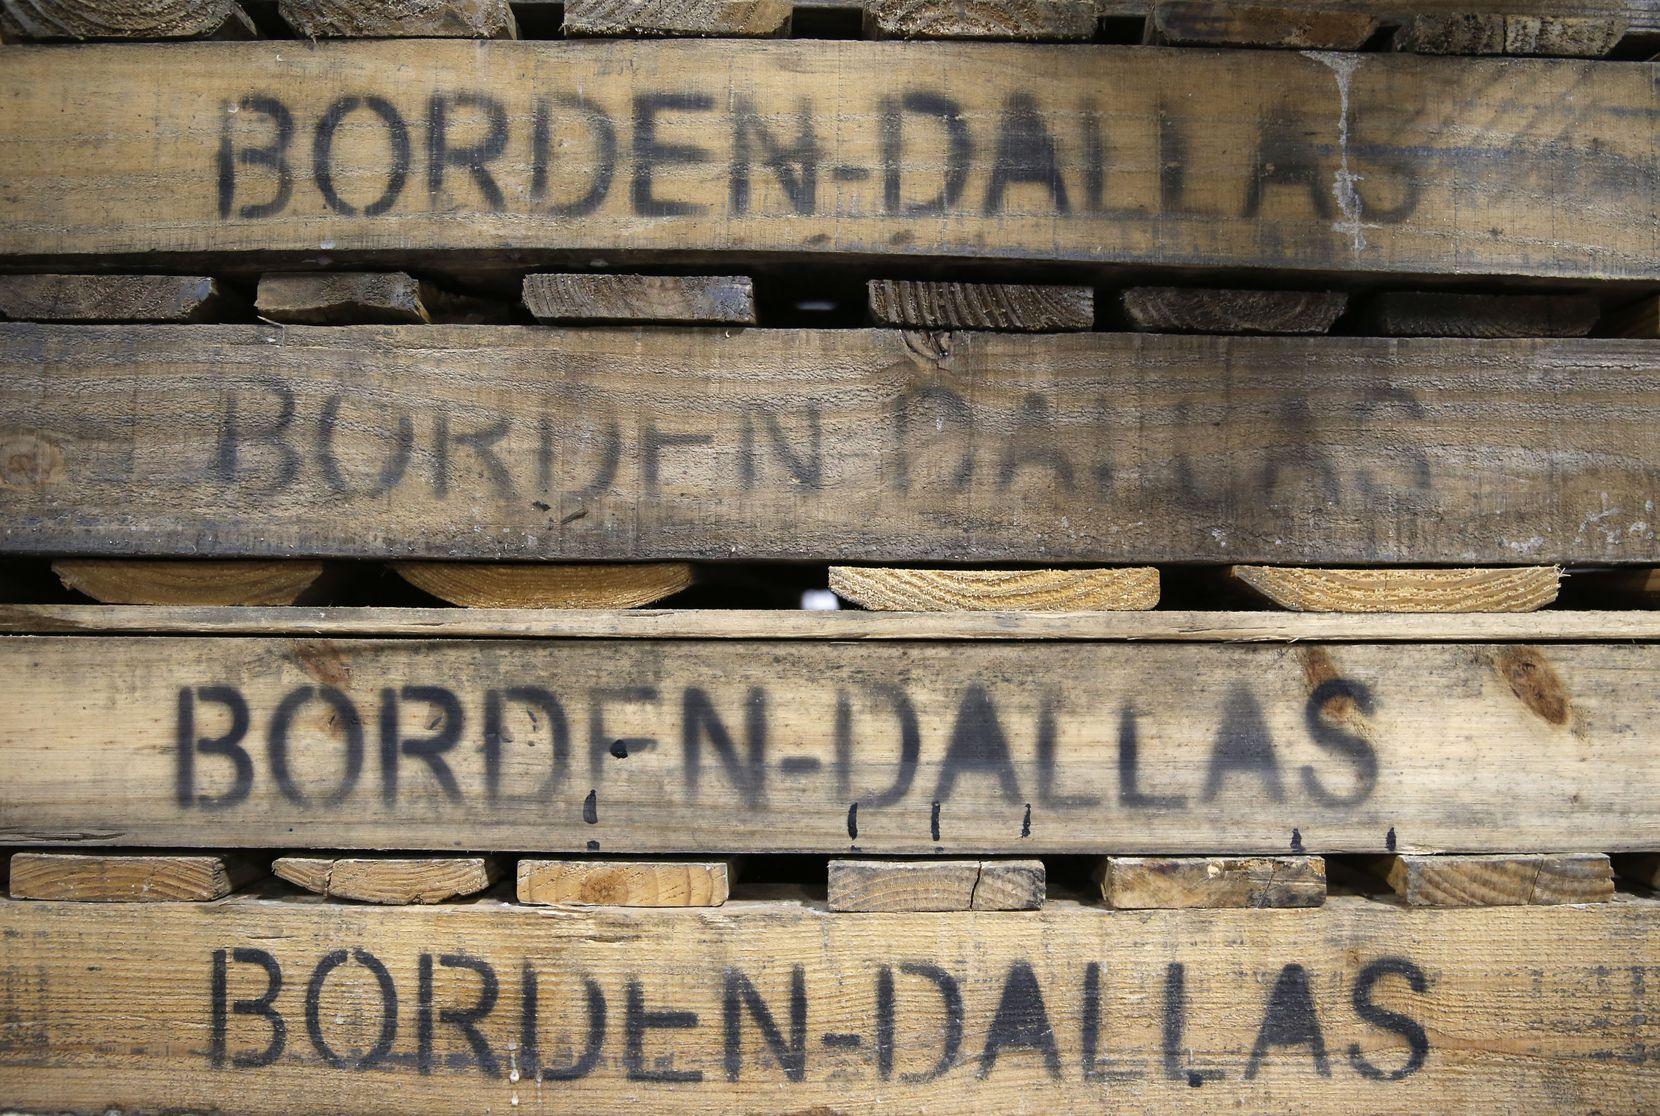 Pallets at Borden Dairy Co. in Dallas.